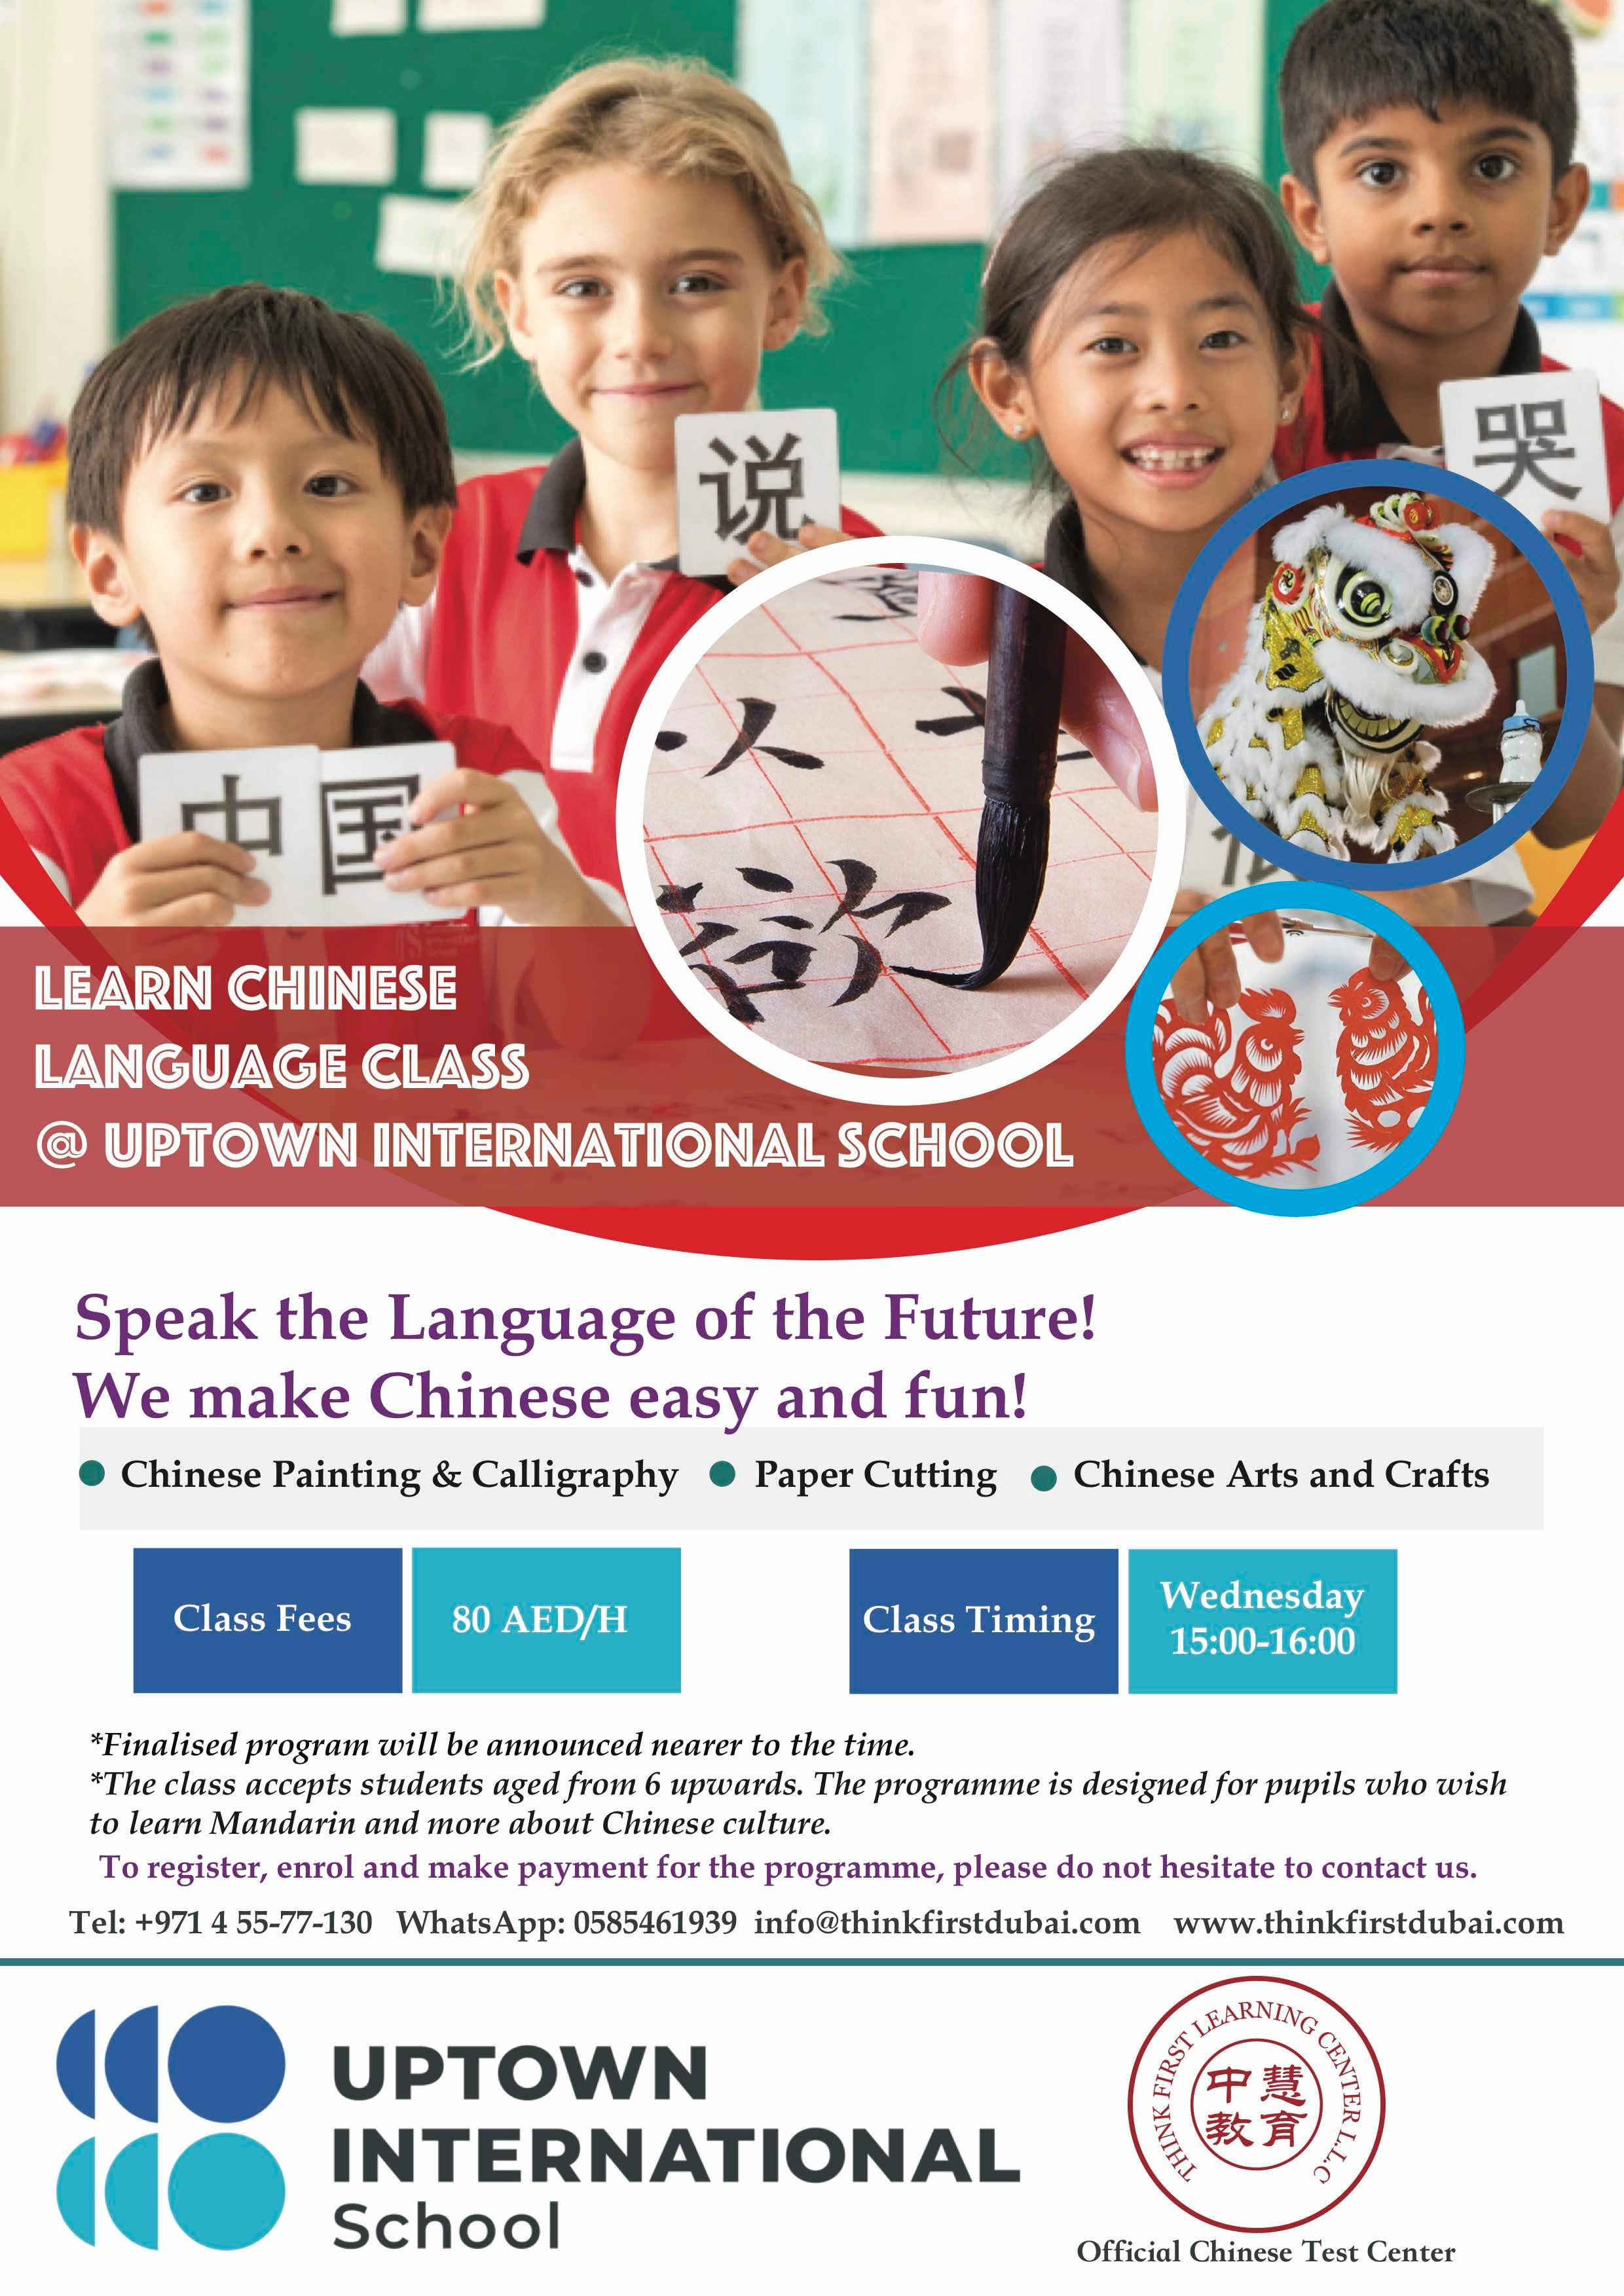 Uptown International School Mandarin